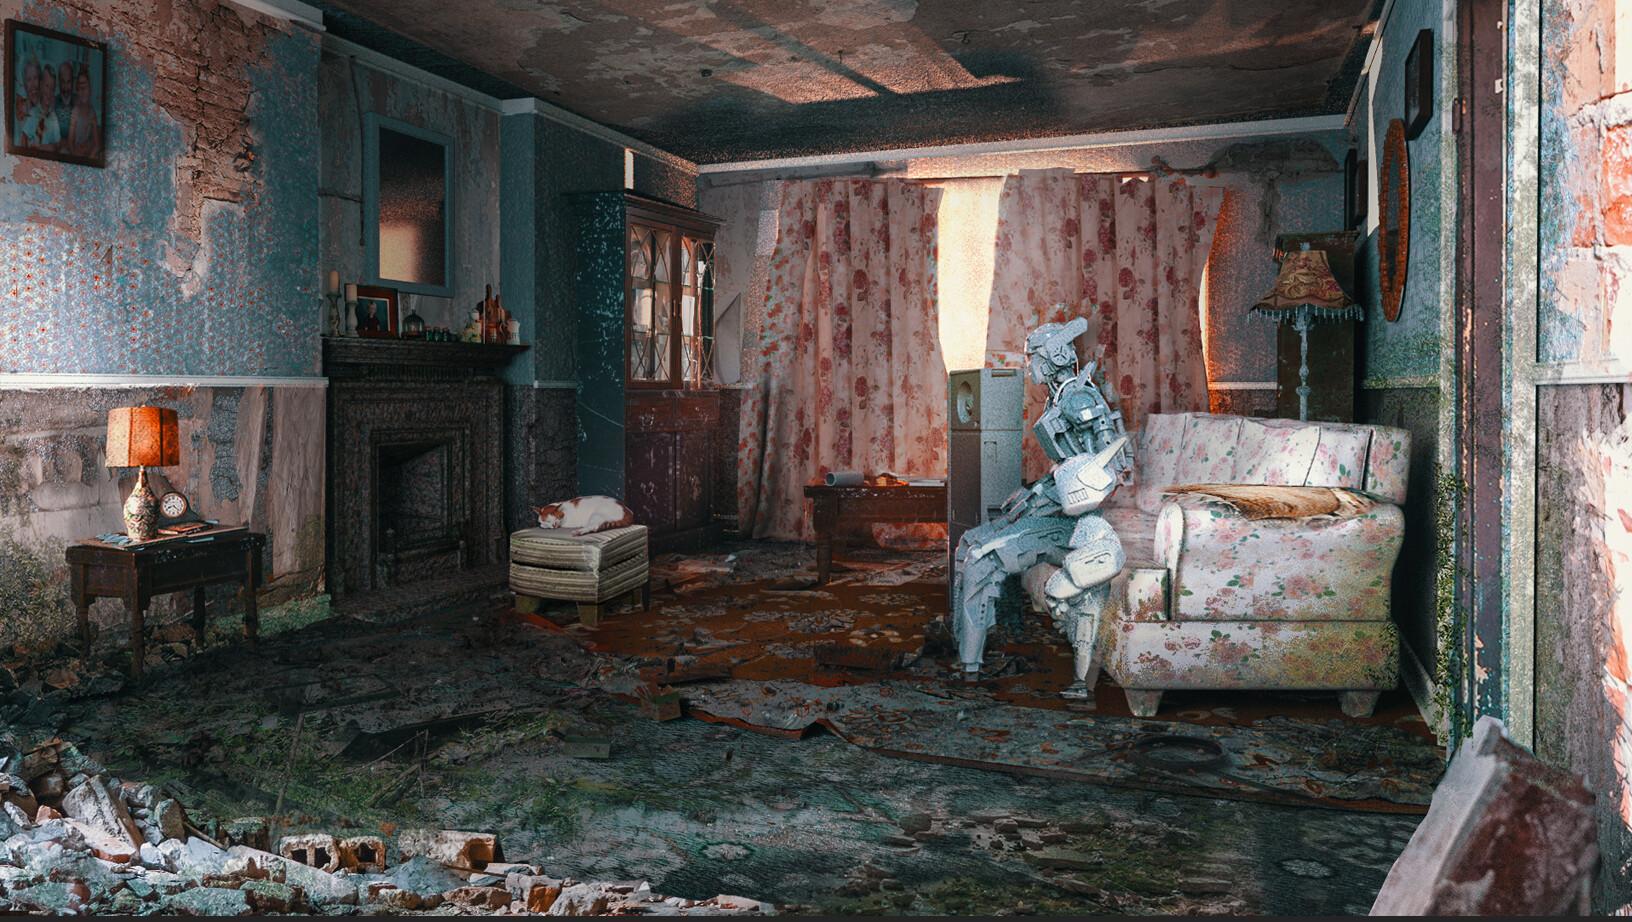 Jonathan ching threerobots house 03